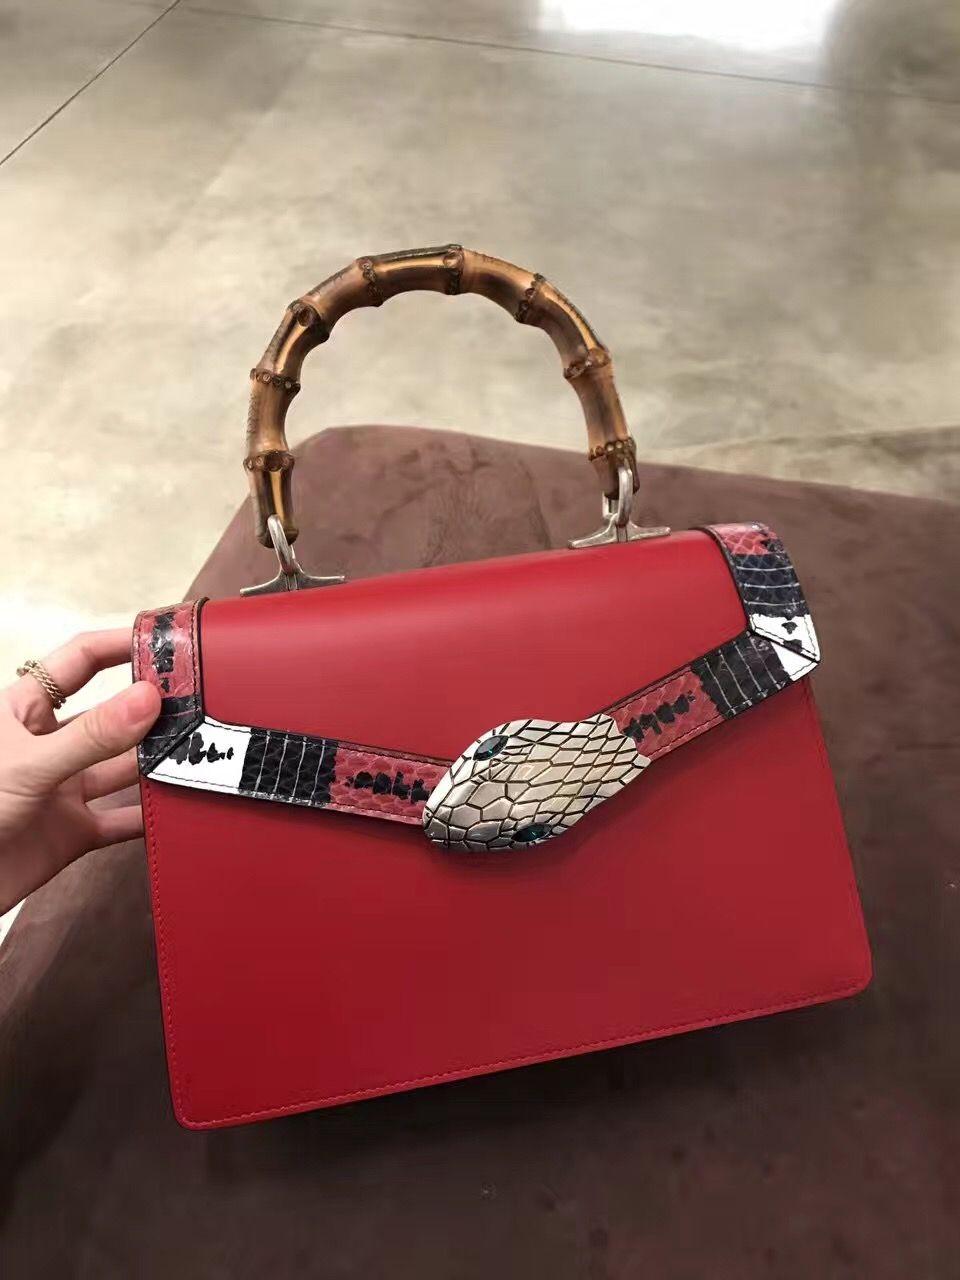 b5f8078b2e2 Gucci snake head bamboo handle bag 453750 #gucci #handle # bag #453750  #bamboo